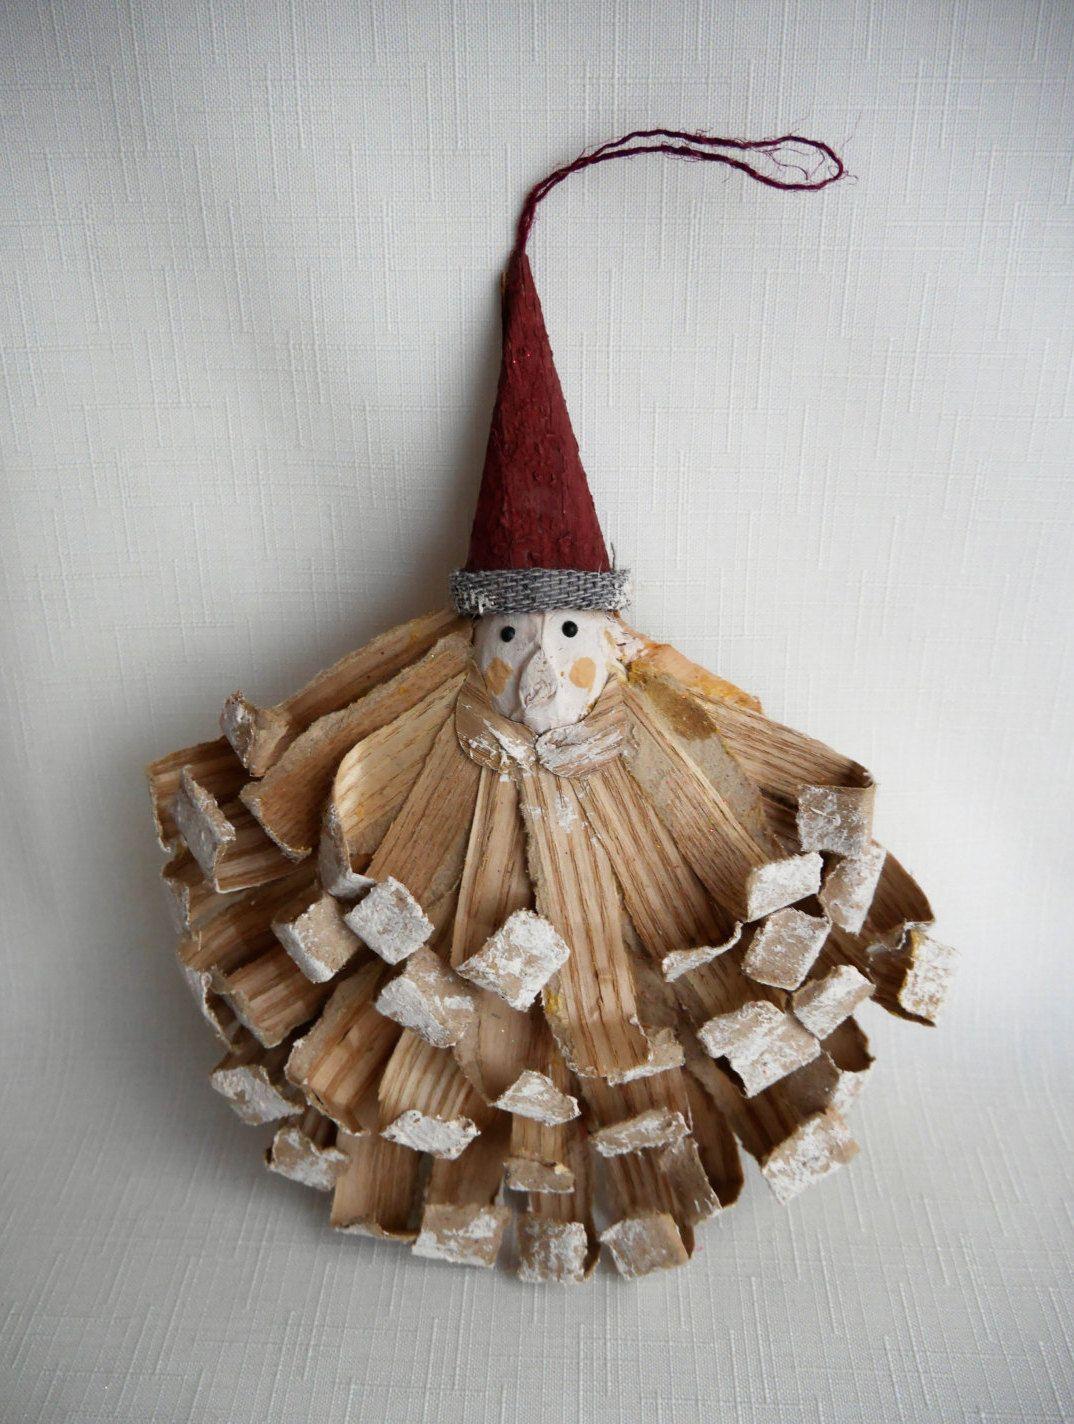 Unique Santa Claus Folk Art Ornament with Curled Palm Fronds, Pod Base, Paper Mache Hat, Unusual Primitive Tree Trim by CactusWrenVintage on Etsy